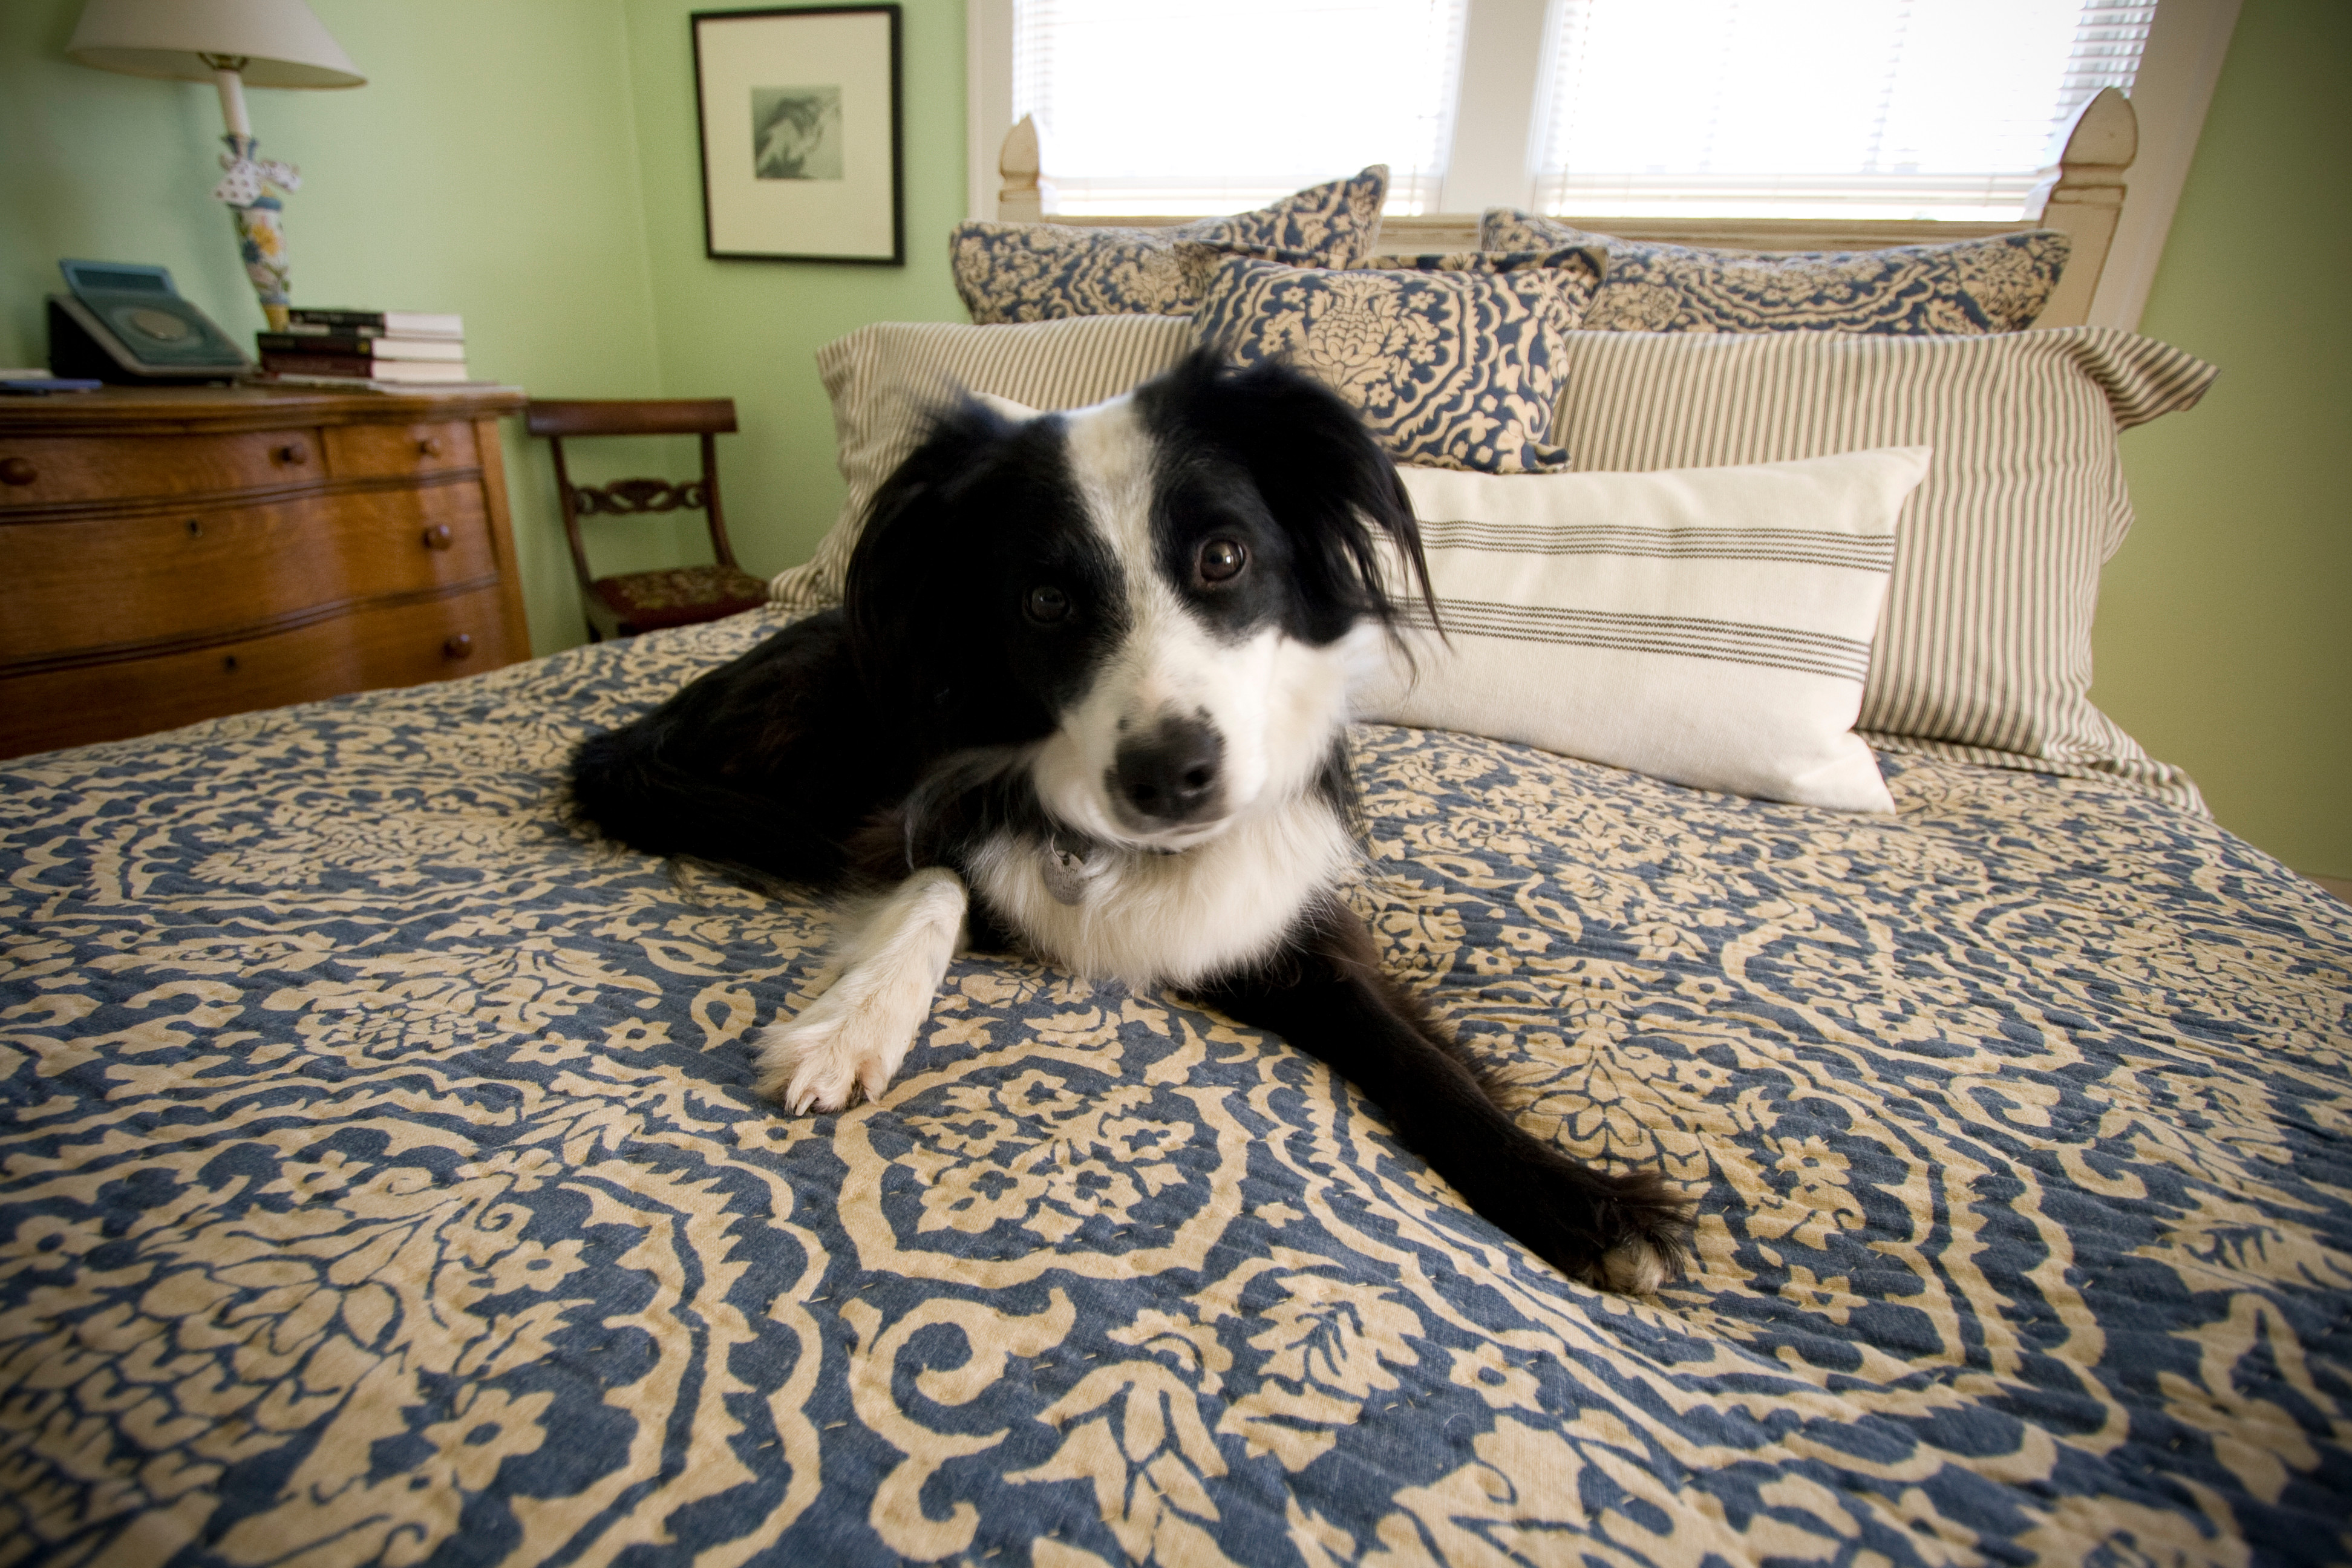 Drop-in Dog Visit